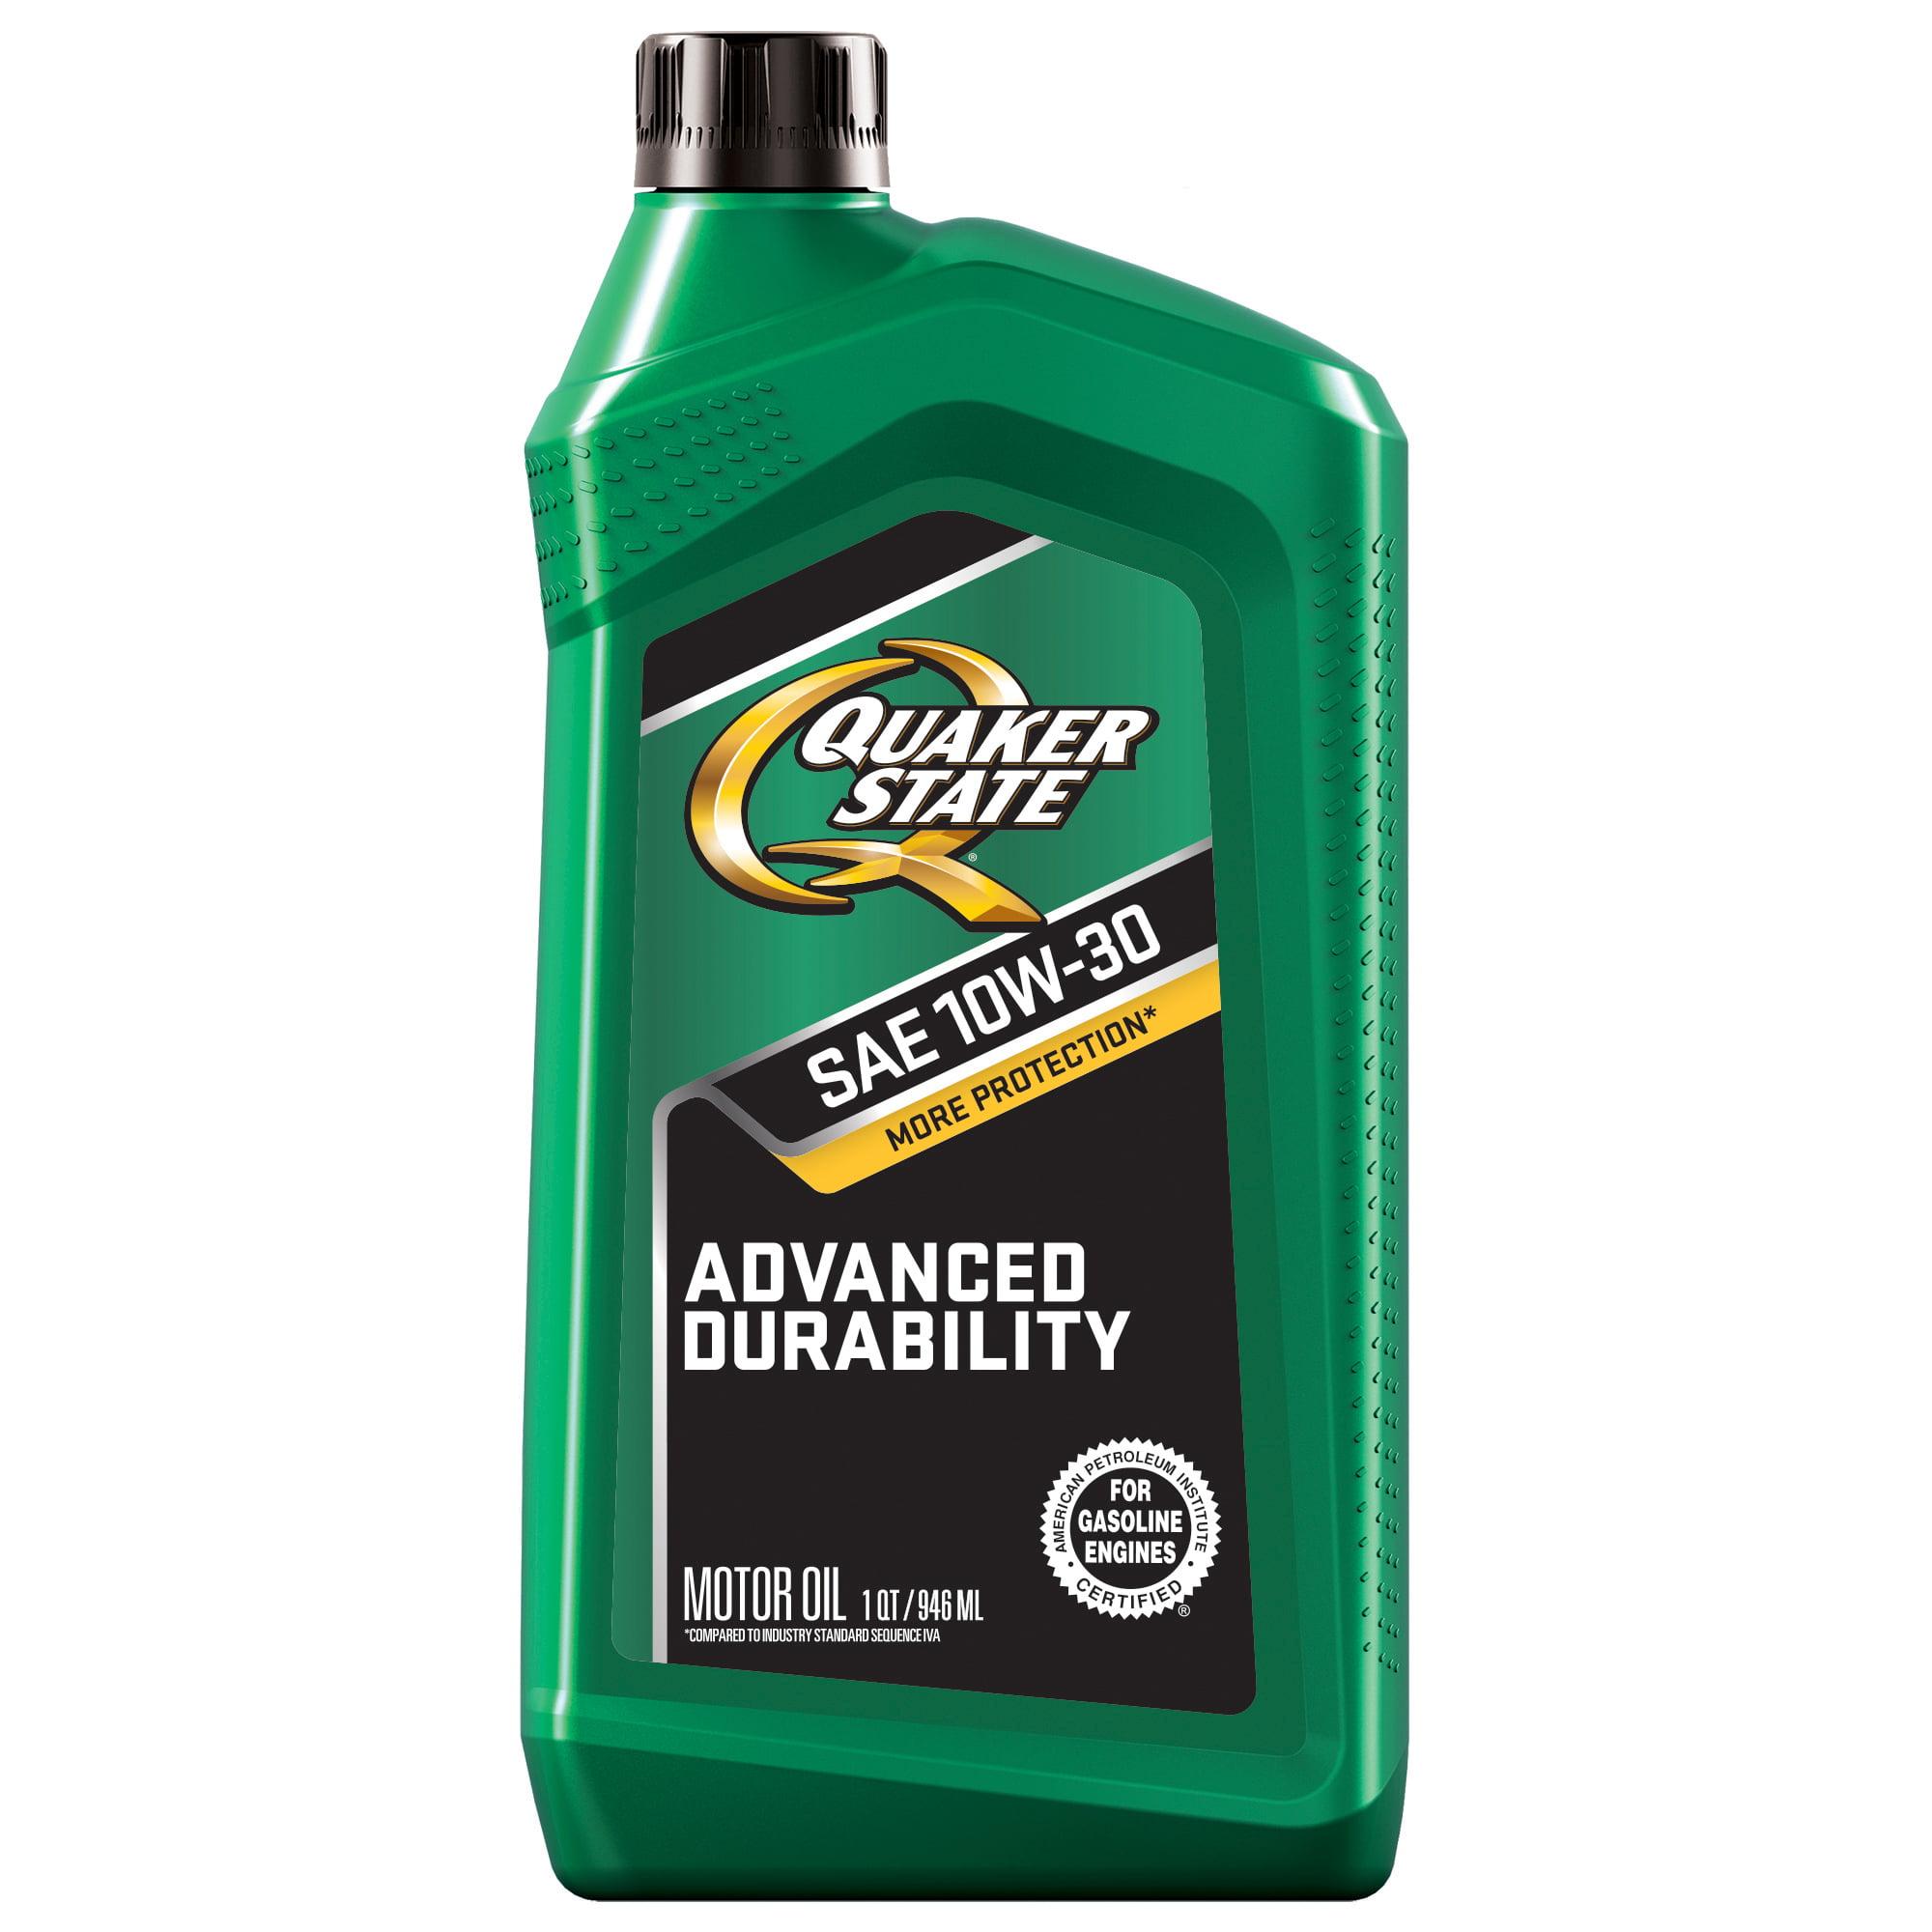 Quaker State Advanced Durability 10W-30 Motor Oil, 1 qt - Walmart